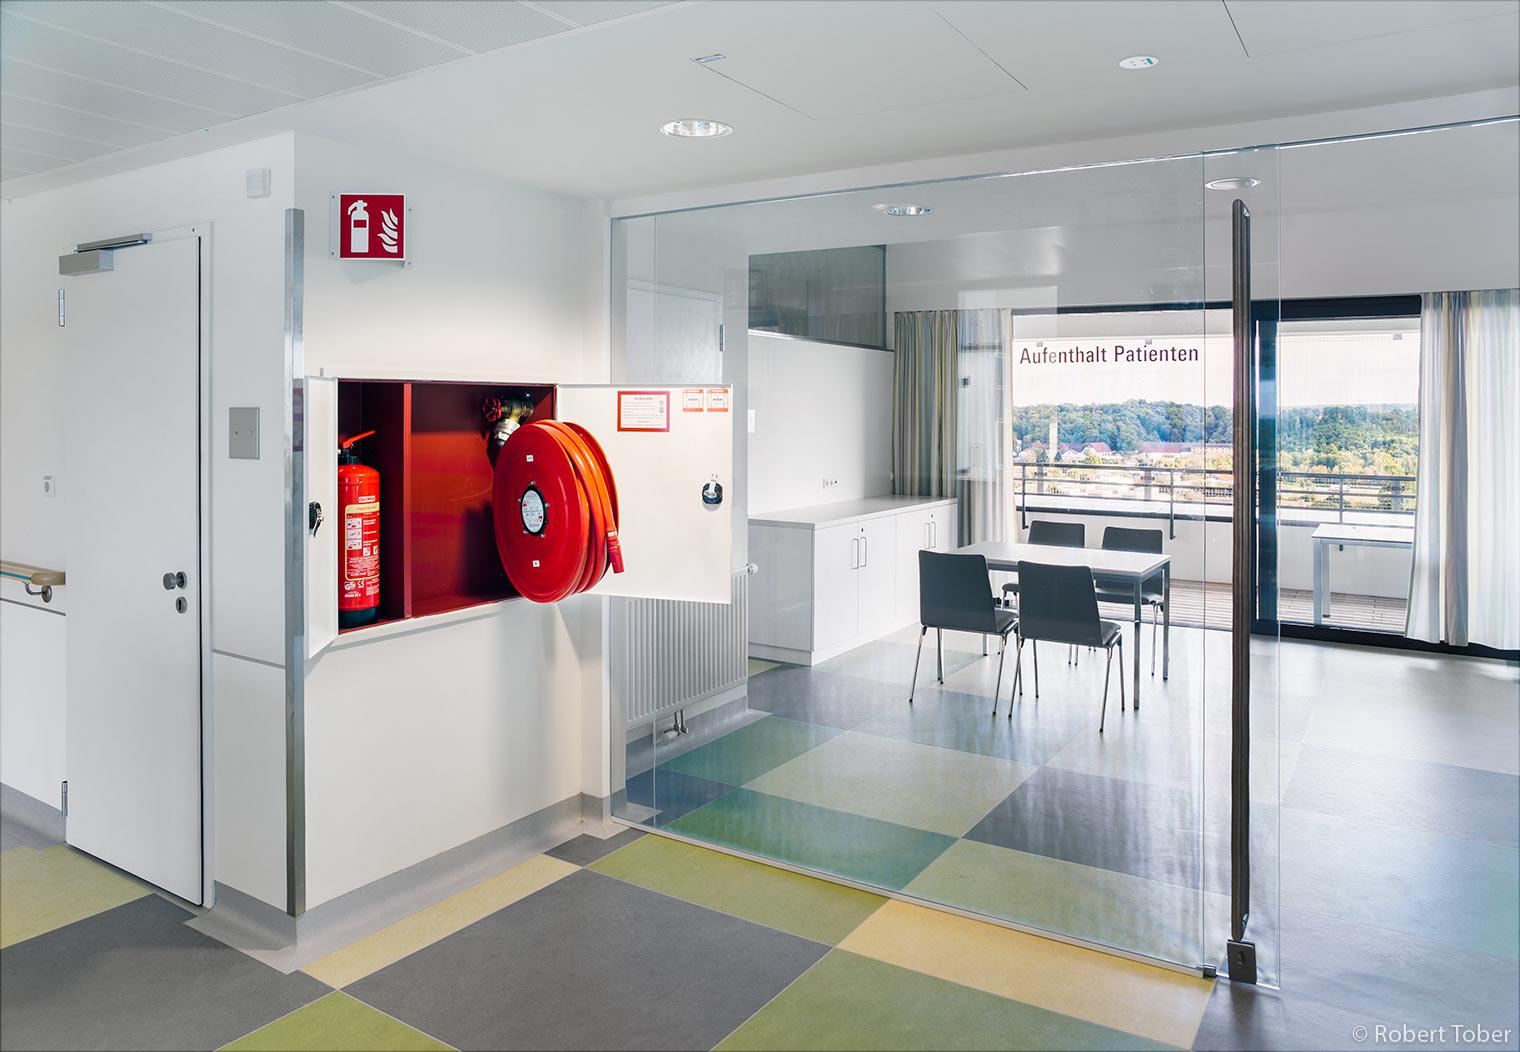 Landesklinikum Mistelbach-Gänserndorf, Wandhydrant neben dem Aufenthaltsraum der Patienten · © Robert Tober · www.toro.cc